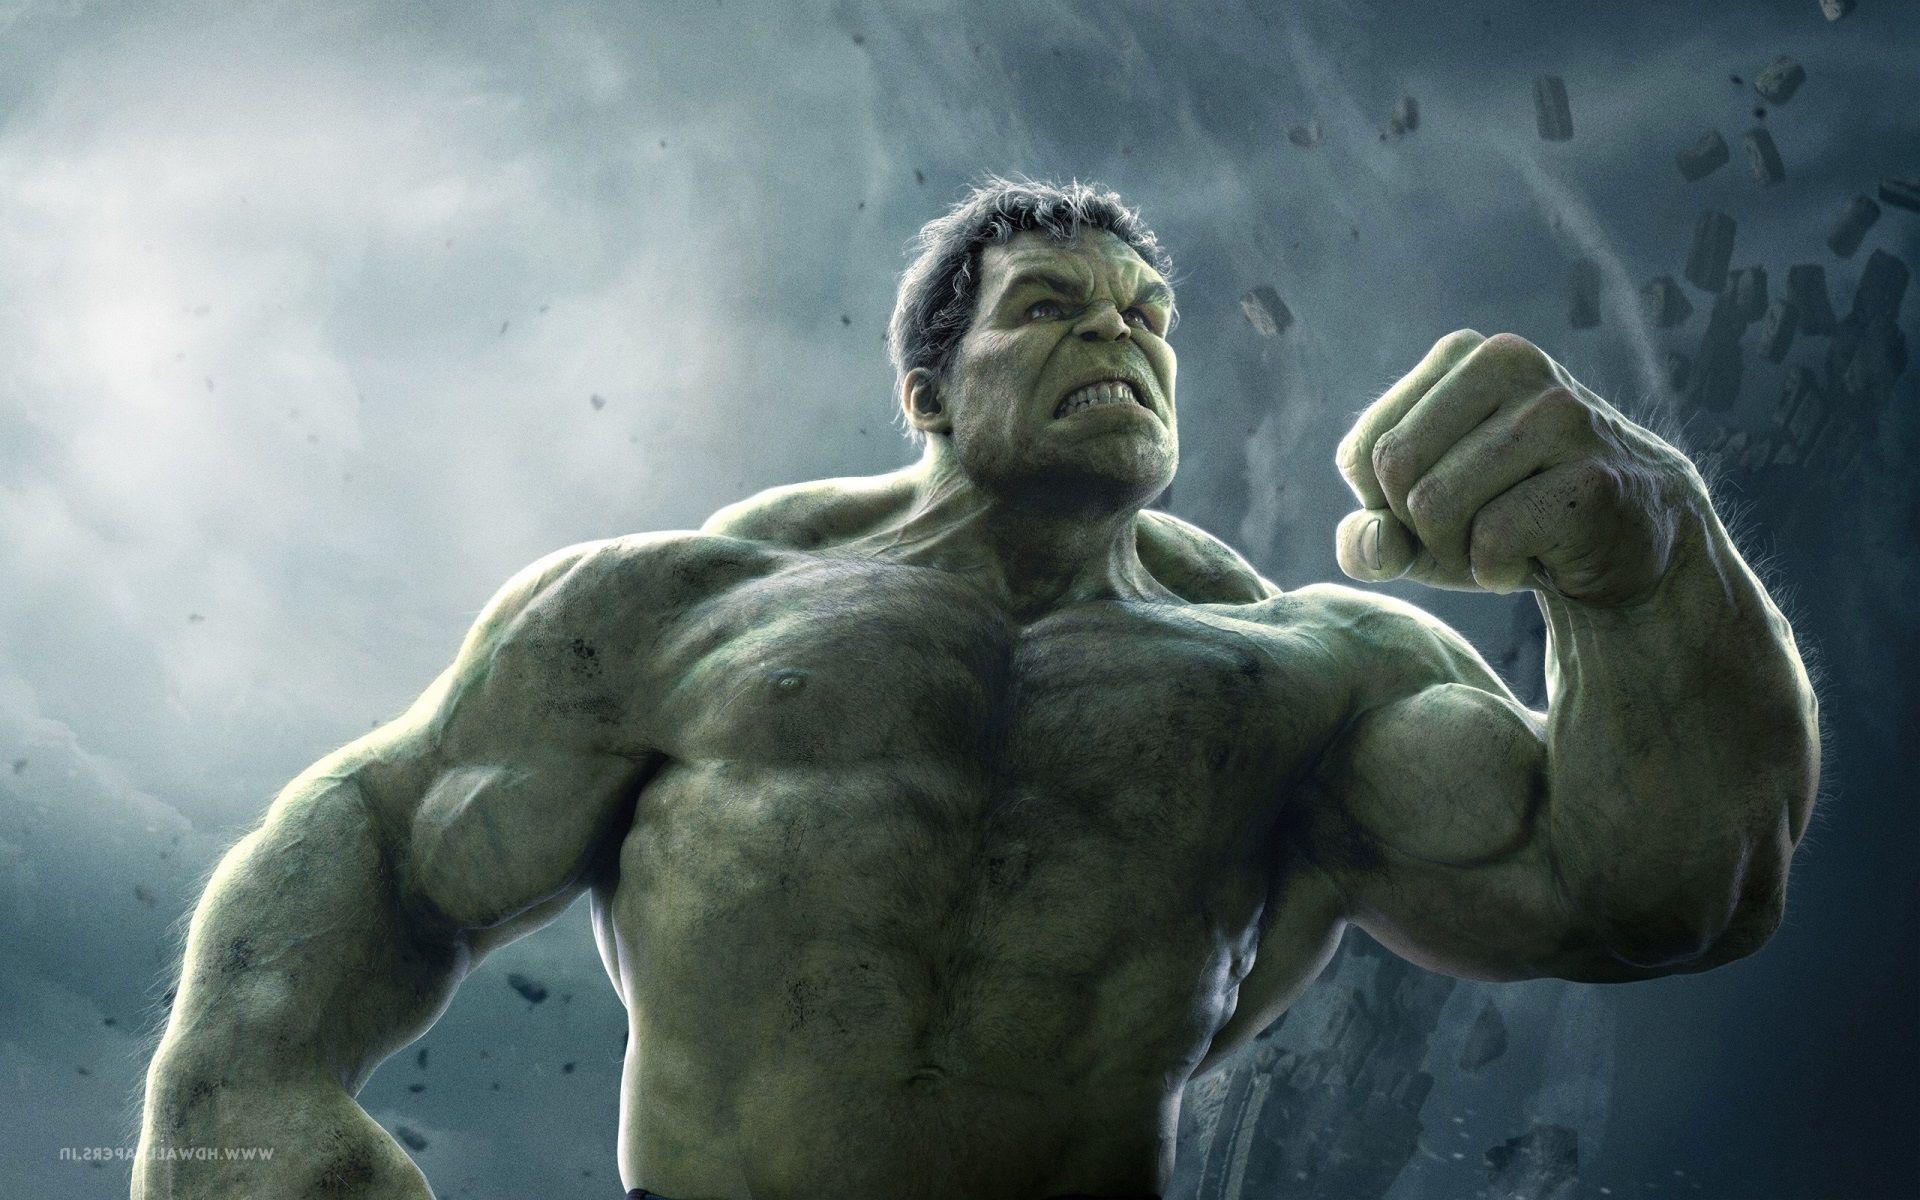 1920x1200 Hulk Wallpaper For Desktop Background Free Download Hulk Avengers Hulk Movie Hulk